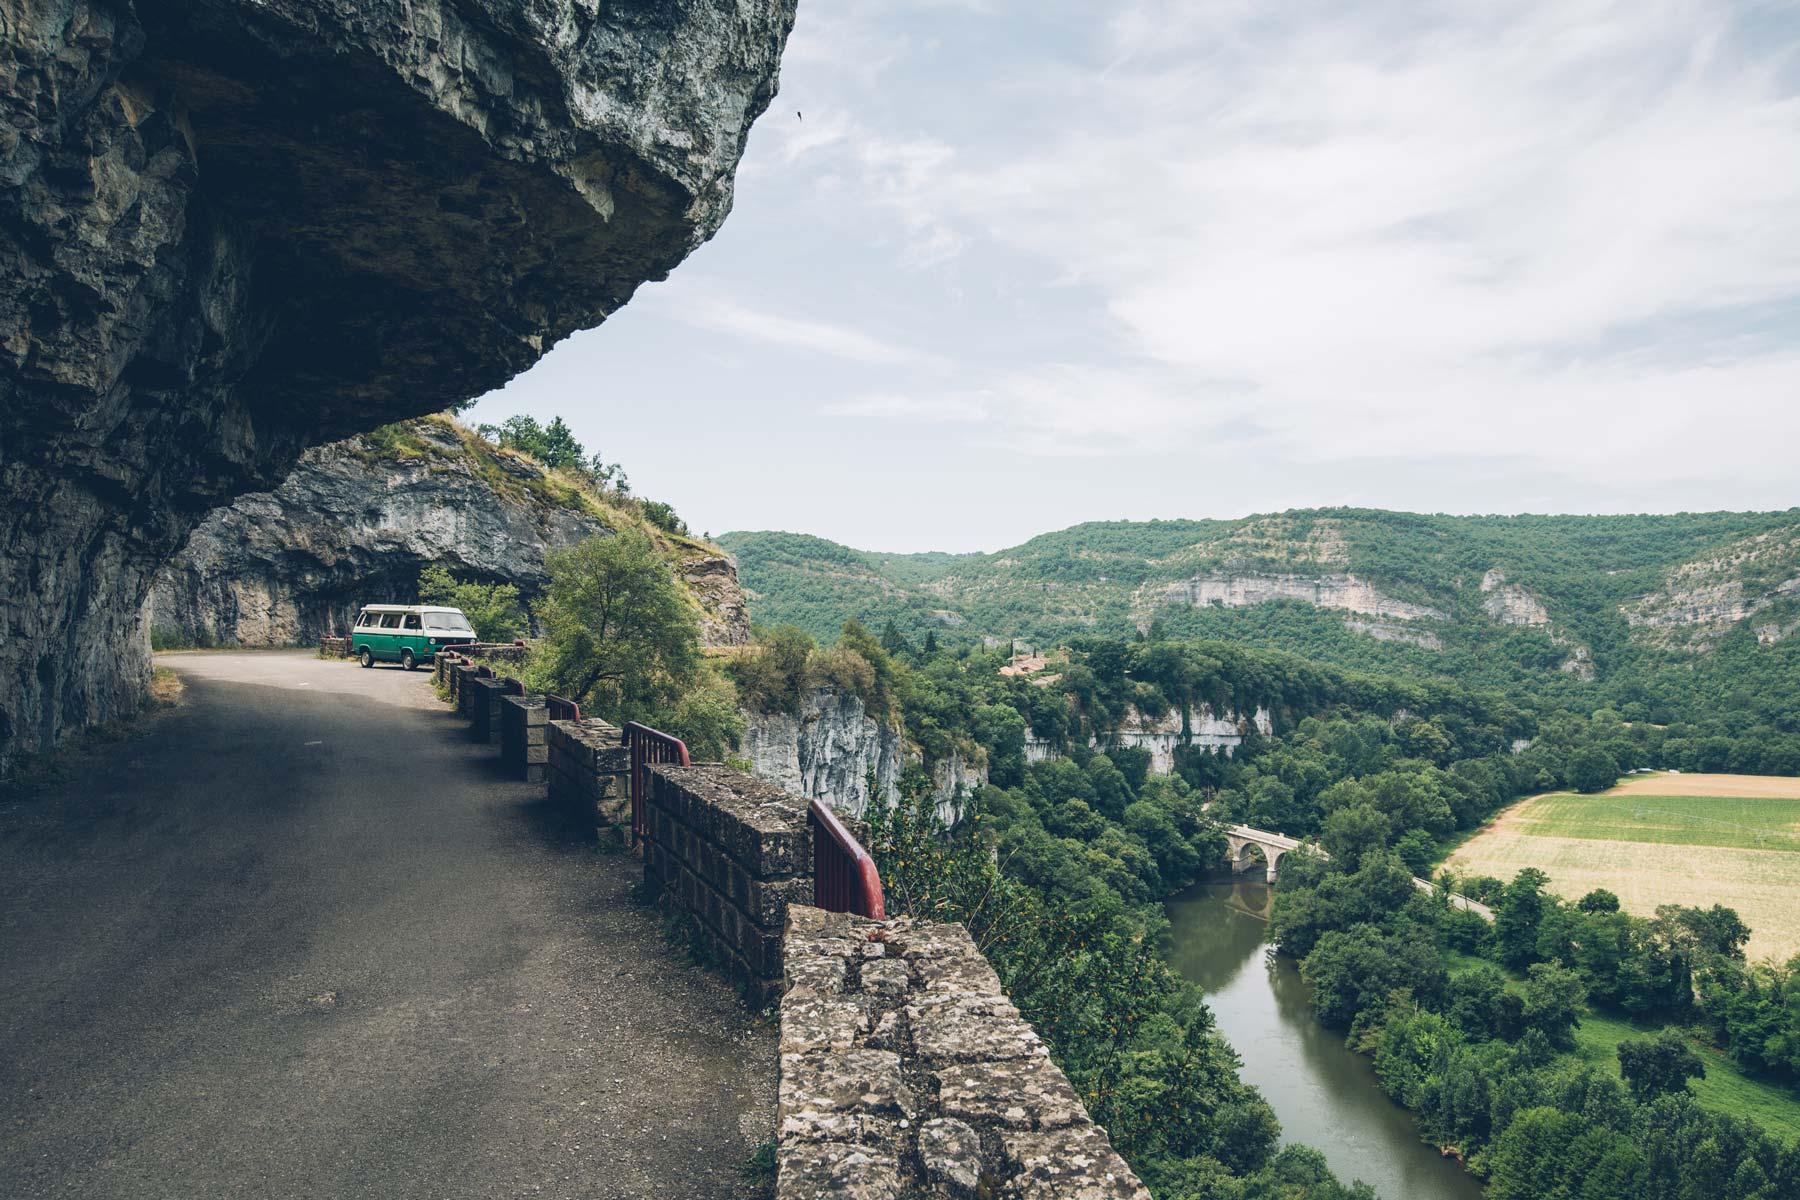 Gorges de L'Aveyron en Tarn et Garonne